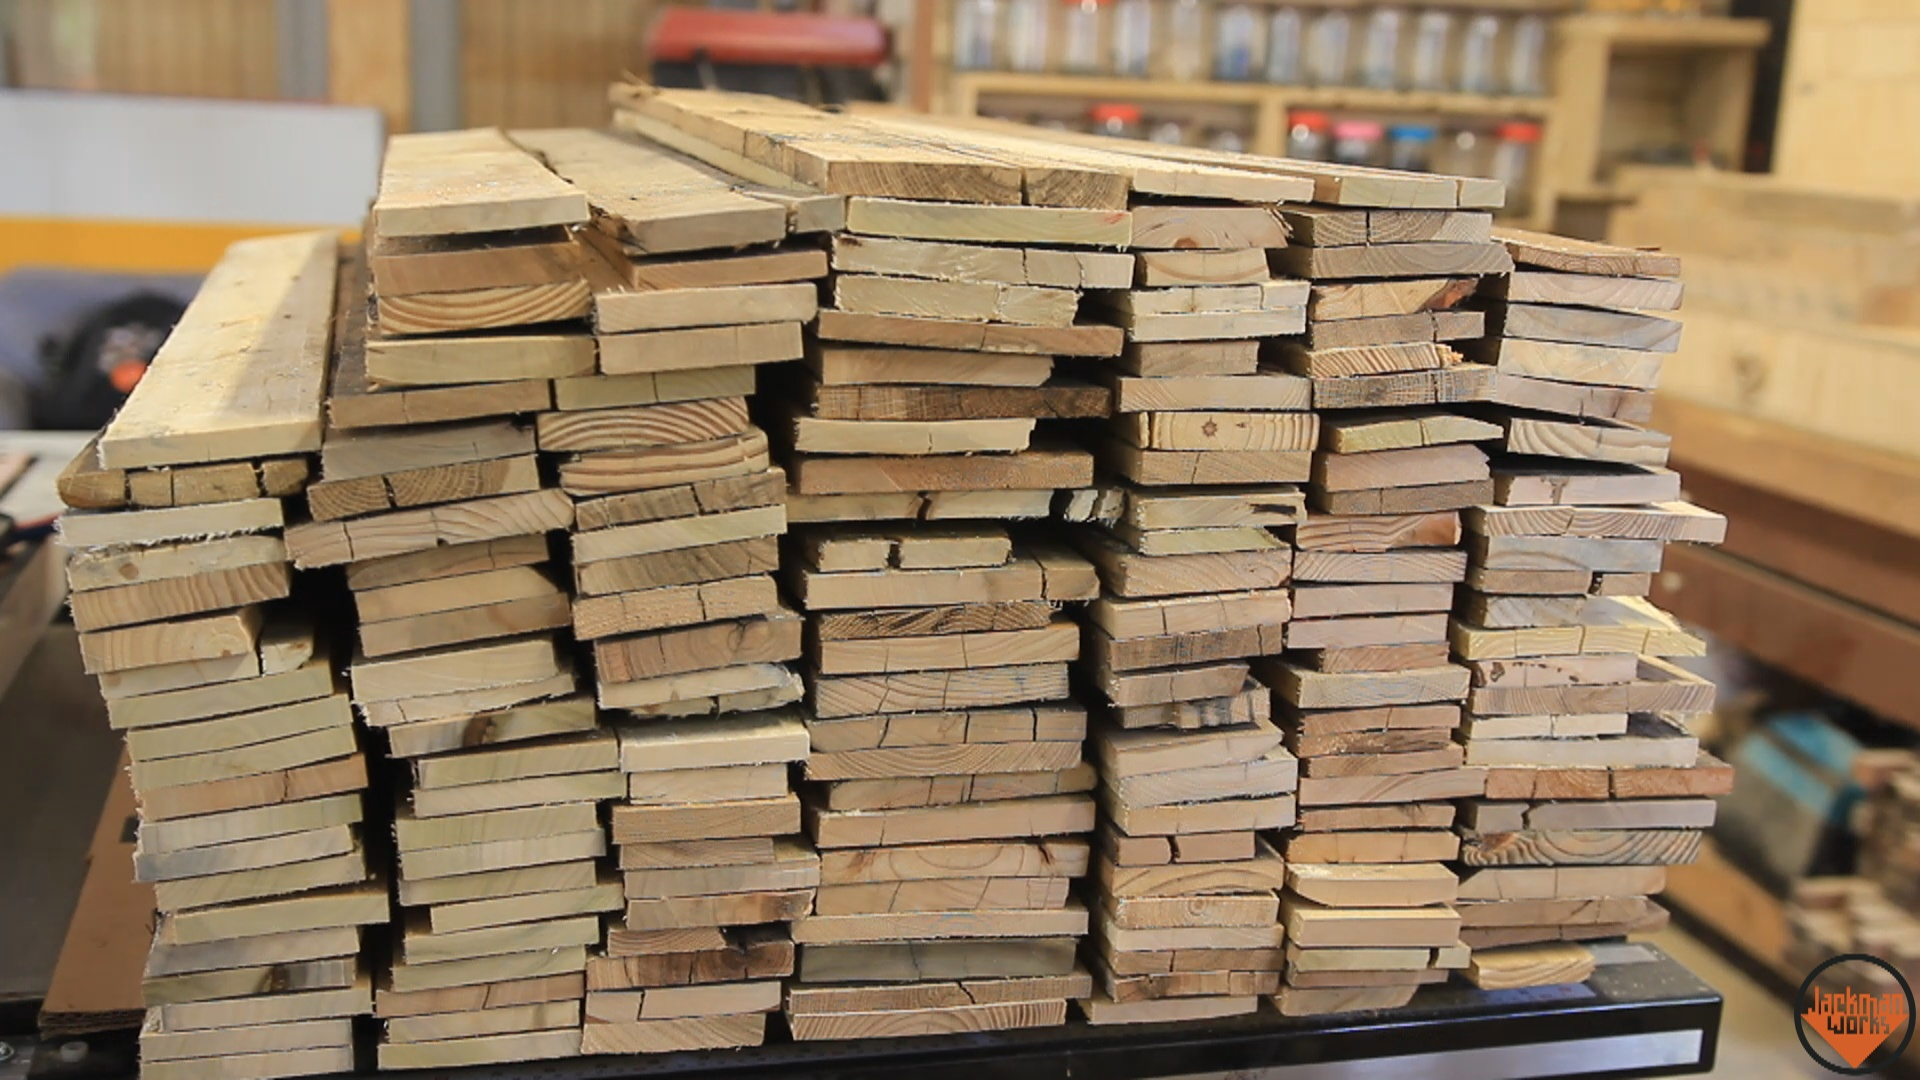 Pallet wood workbenches 6 jackman works jackmanjackman worksworkswoodworkingwooddiydo it yourselfbuildingmakingcreativedesigncustomupcyclerecyclepalletspallet woodpallet wood solutioingenieria Image collections